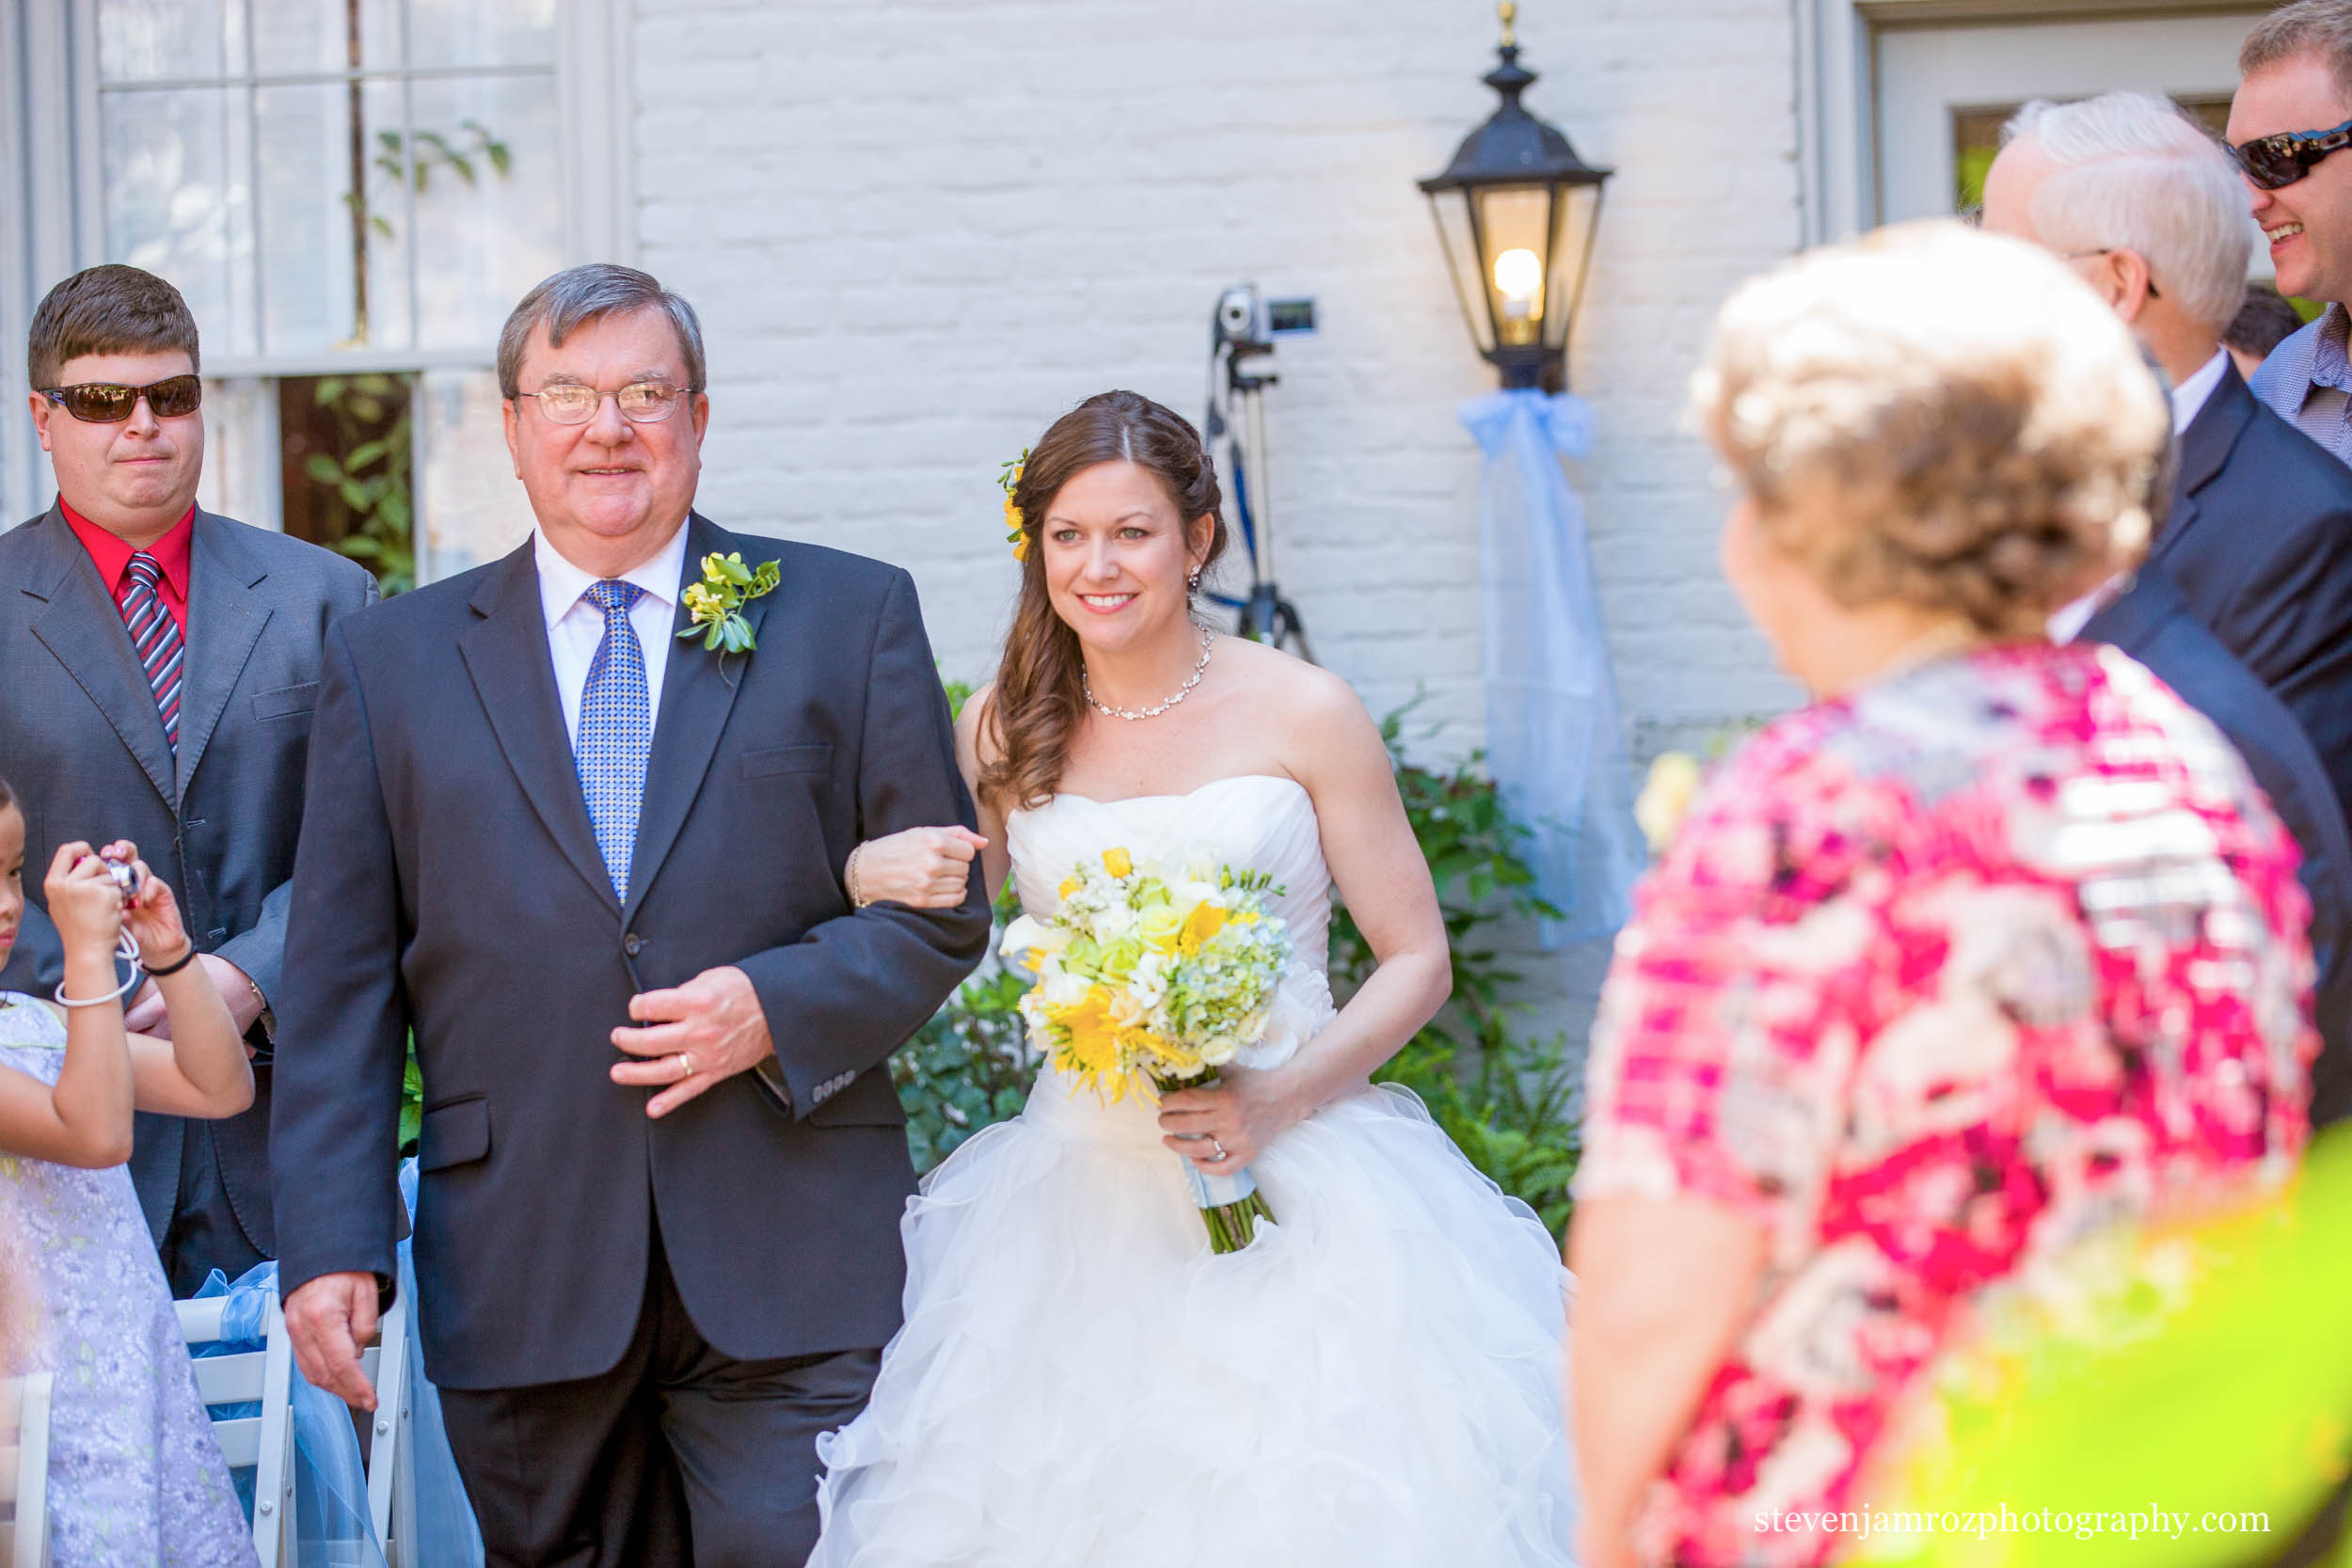 peace-college-wedding-photographer-steven-jamroz-0690.jpg